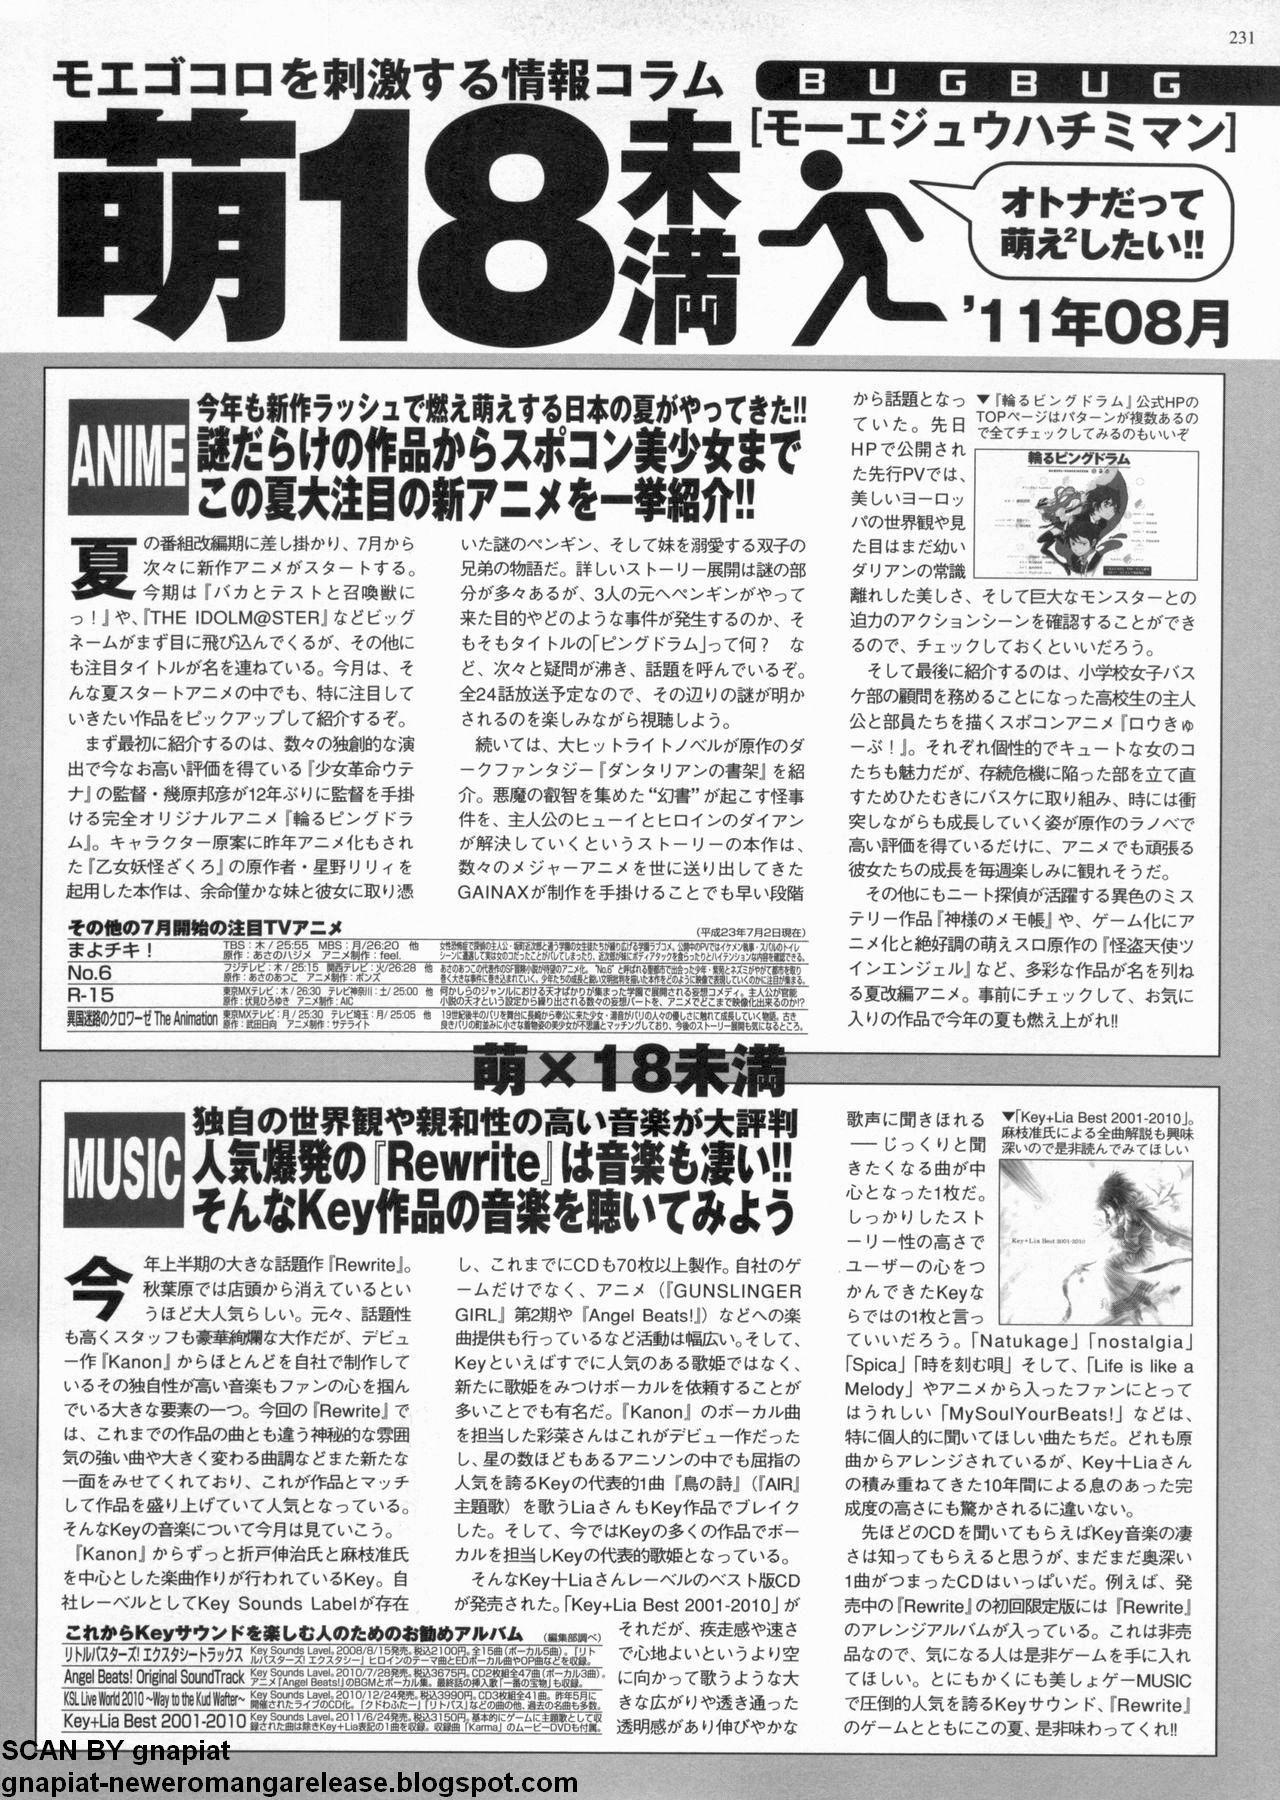 BugBug 2011-08 Vol. 204 228